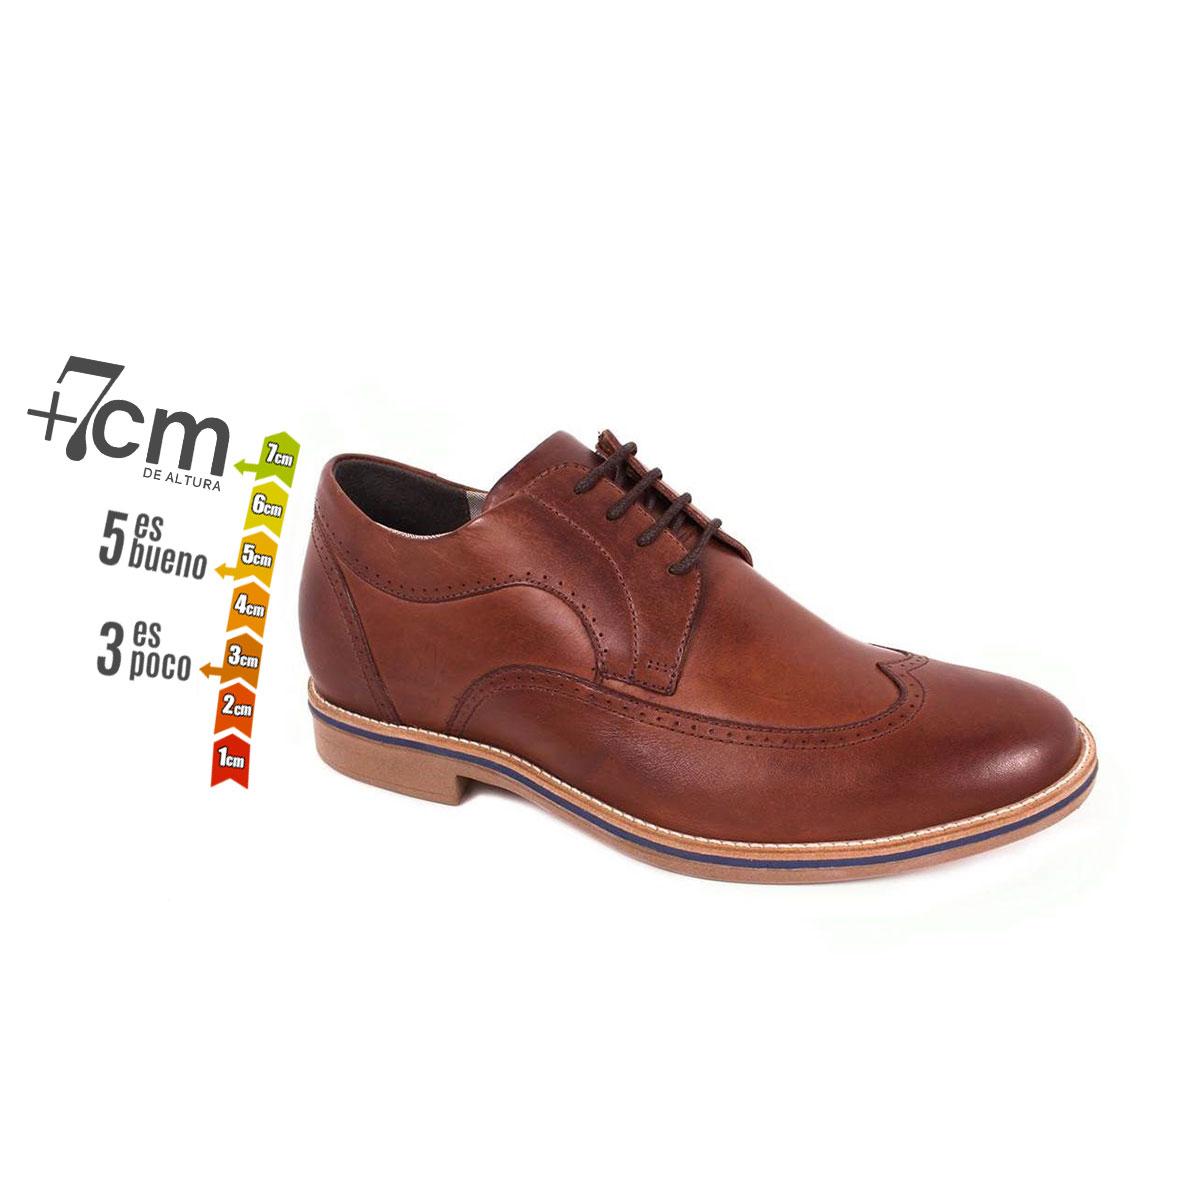 Zapato Casual Oxford Café Oscuro Max Denegri +7cm de Altura_74112